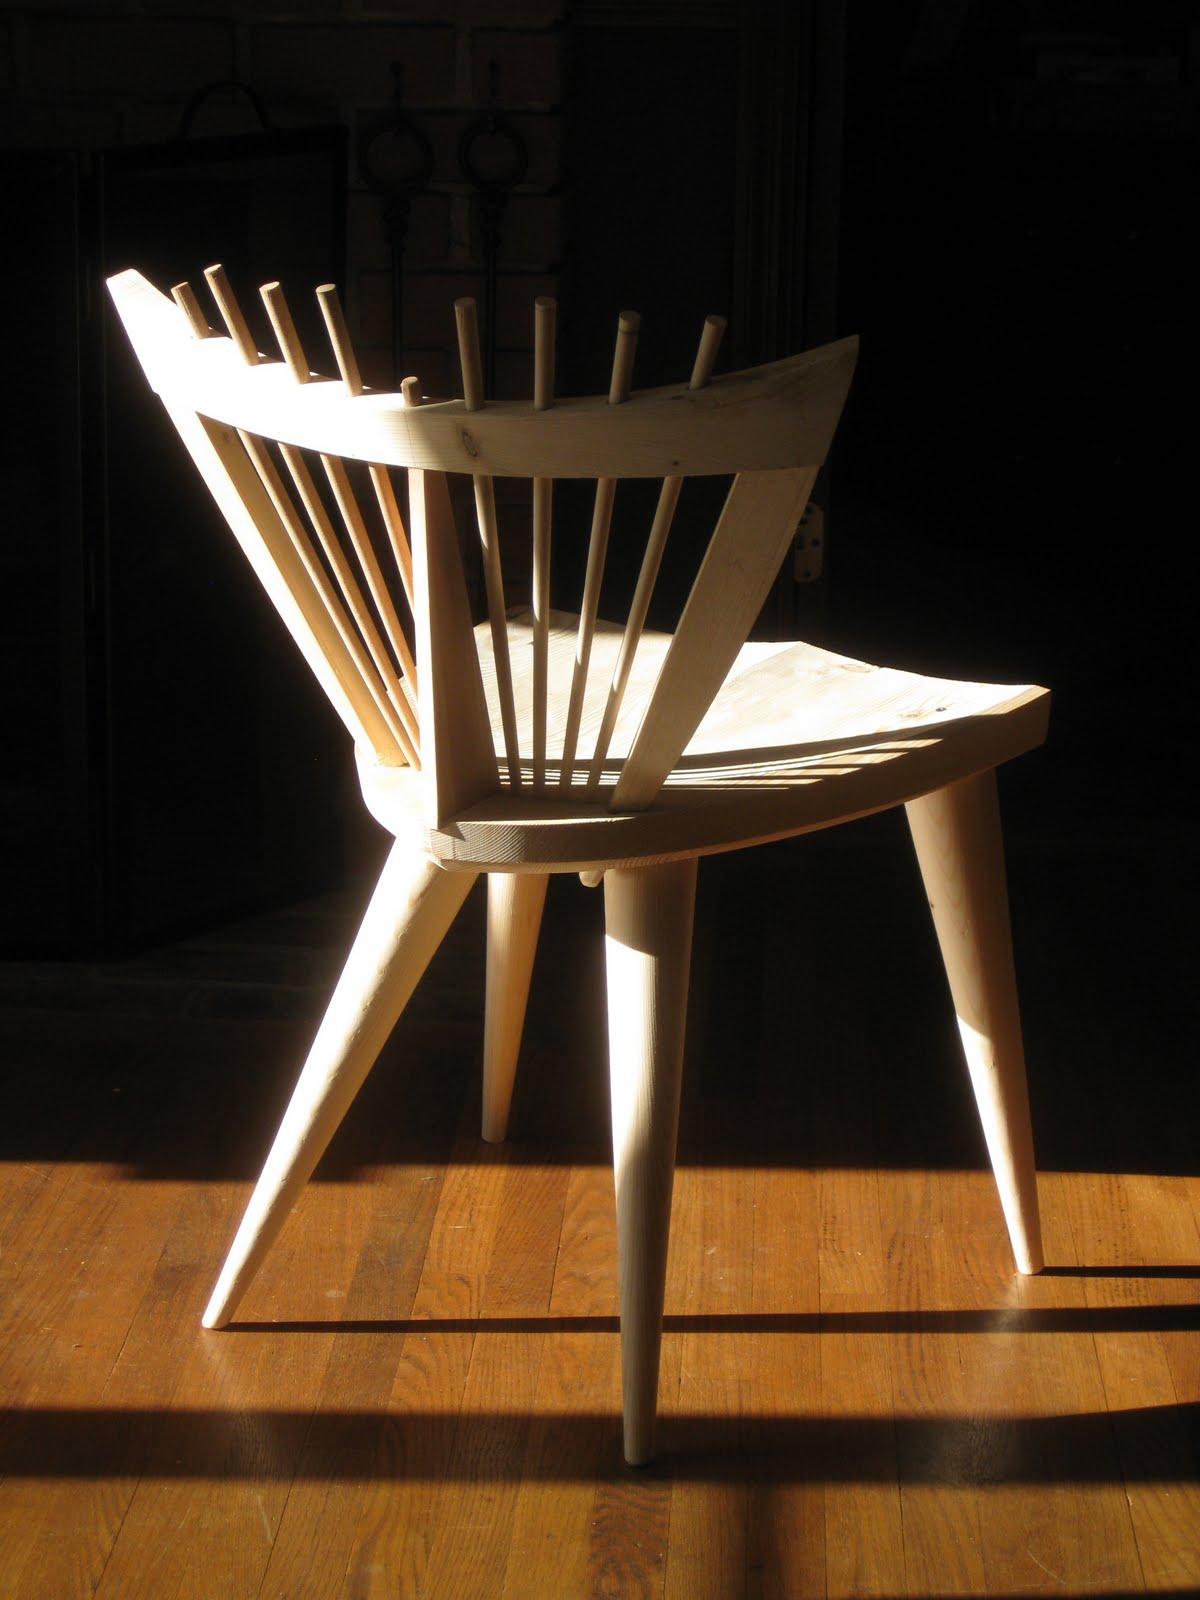 Richard W Townsend Furniture Design Restoration New Windsor